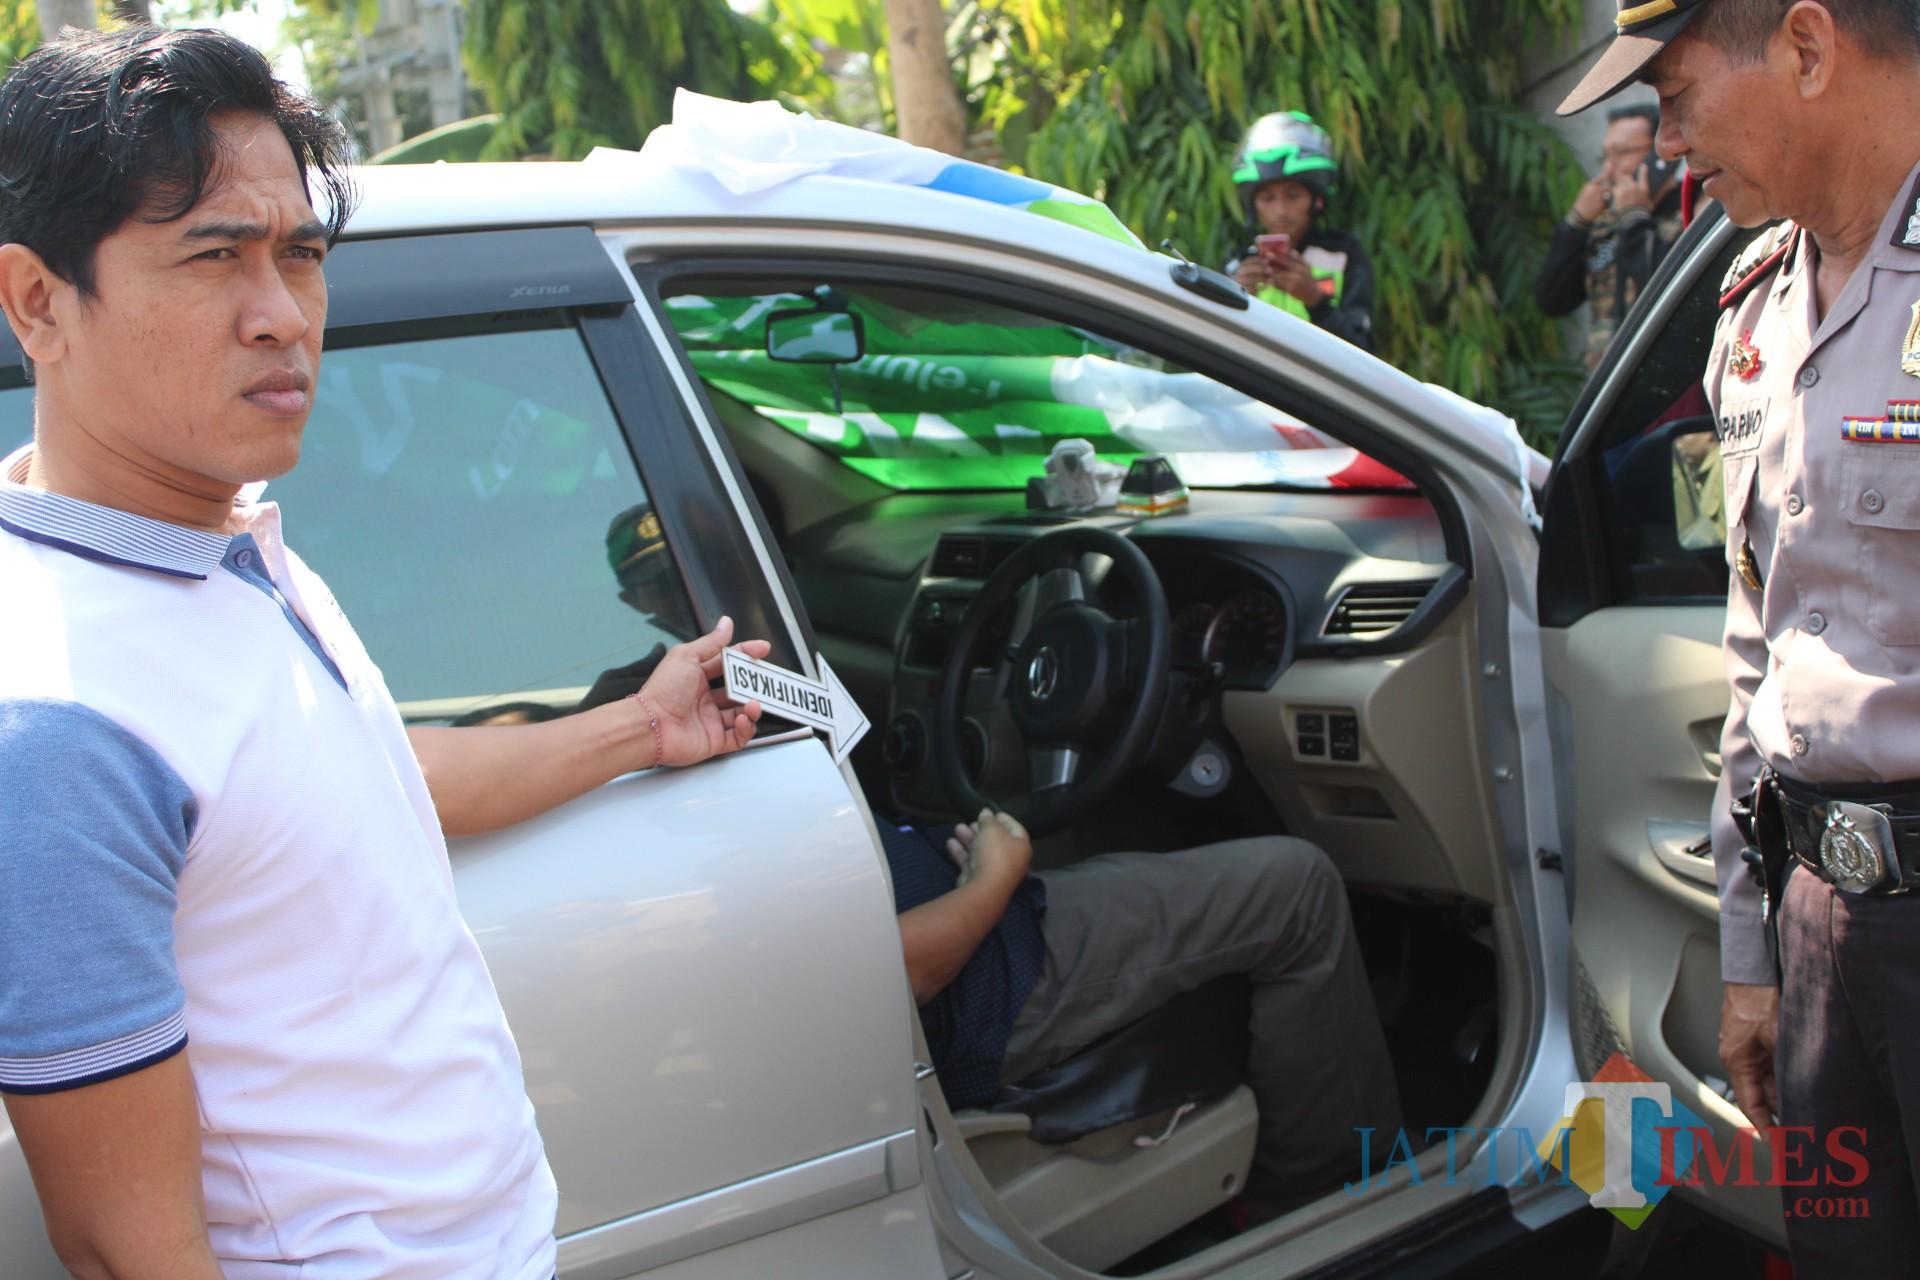 Proses olah TKP penemuan orang meninggal dunia mendadak di SPBU Sambong Dukuh. (Foto : Adi Rosul/ JombangTIMES)